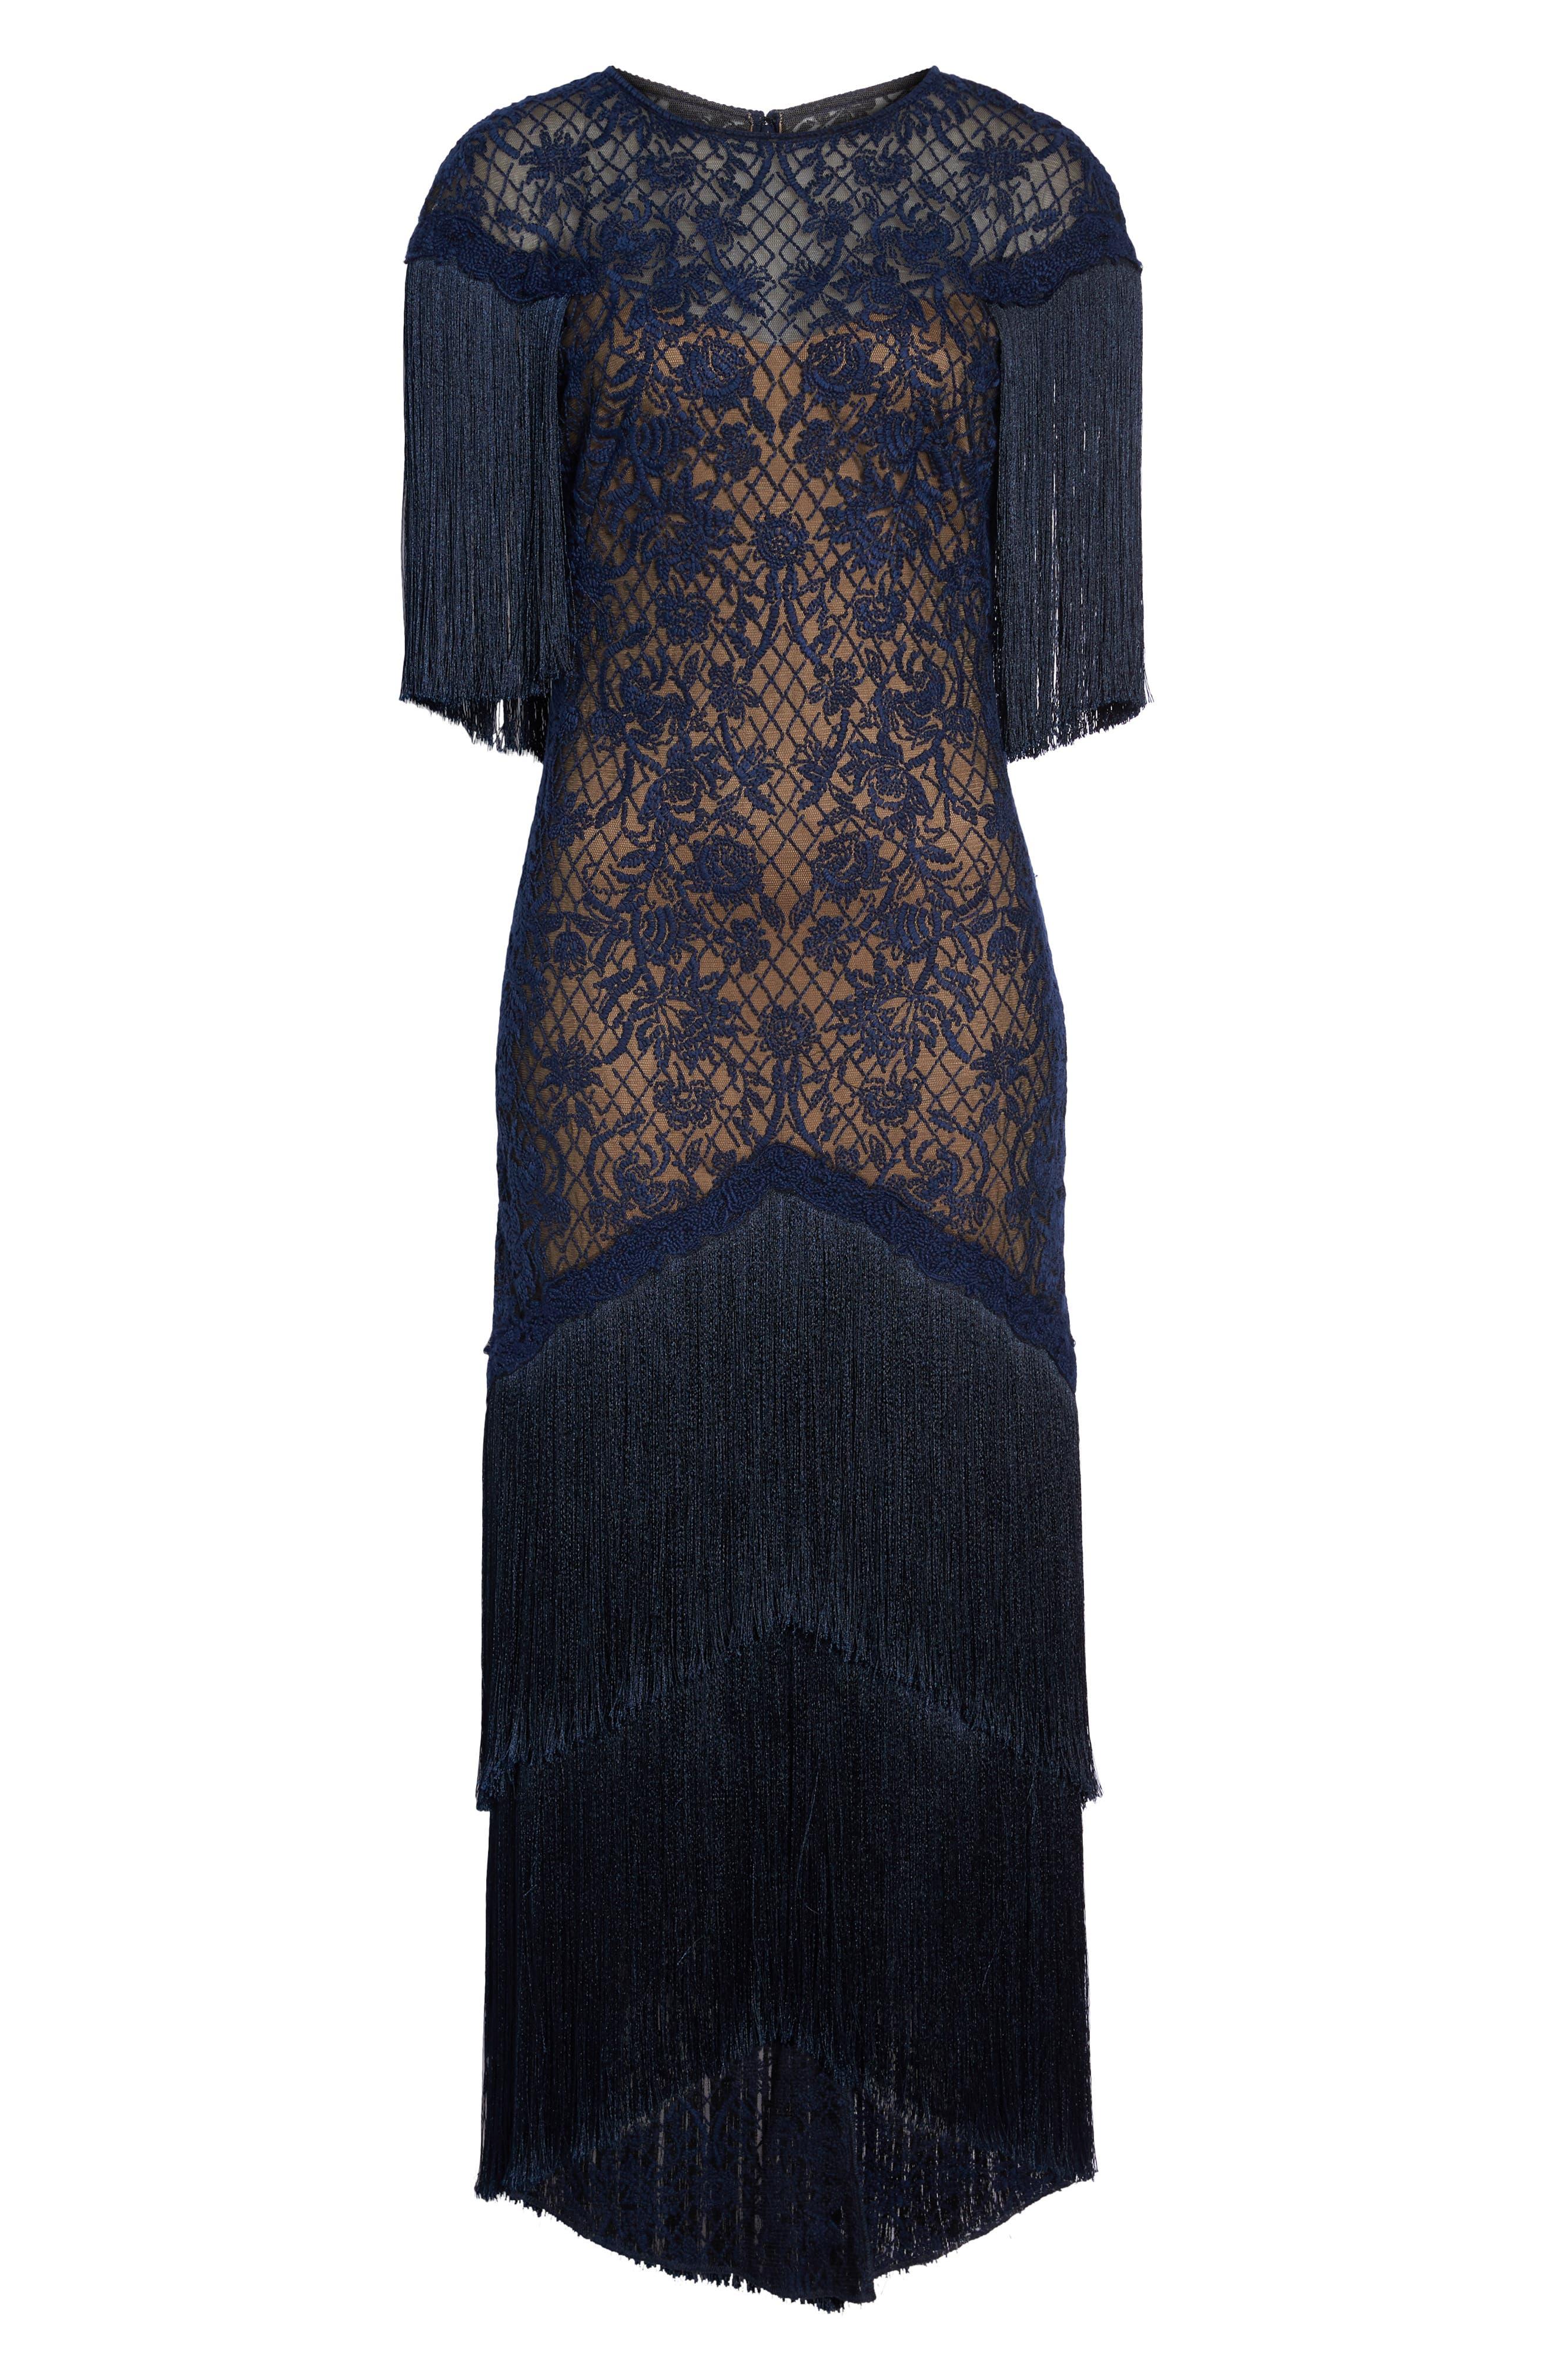 TADASHI SHOJI, Embroidered Mesh & Fringe Gown, Alternate thumbnail 6, color, MIDNIGHT/ NUDE